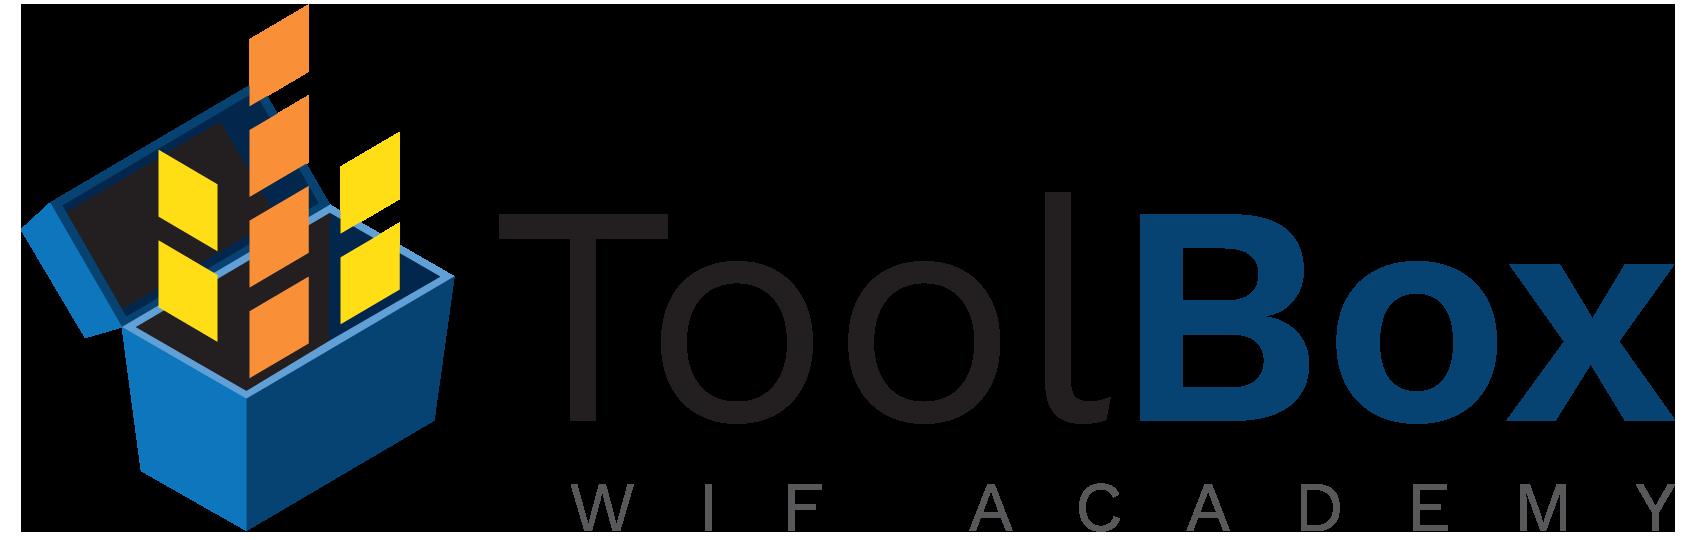 ToolBox-wif-academy